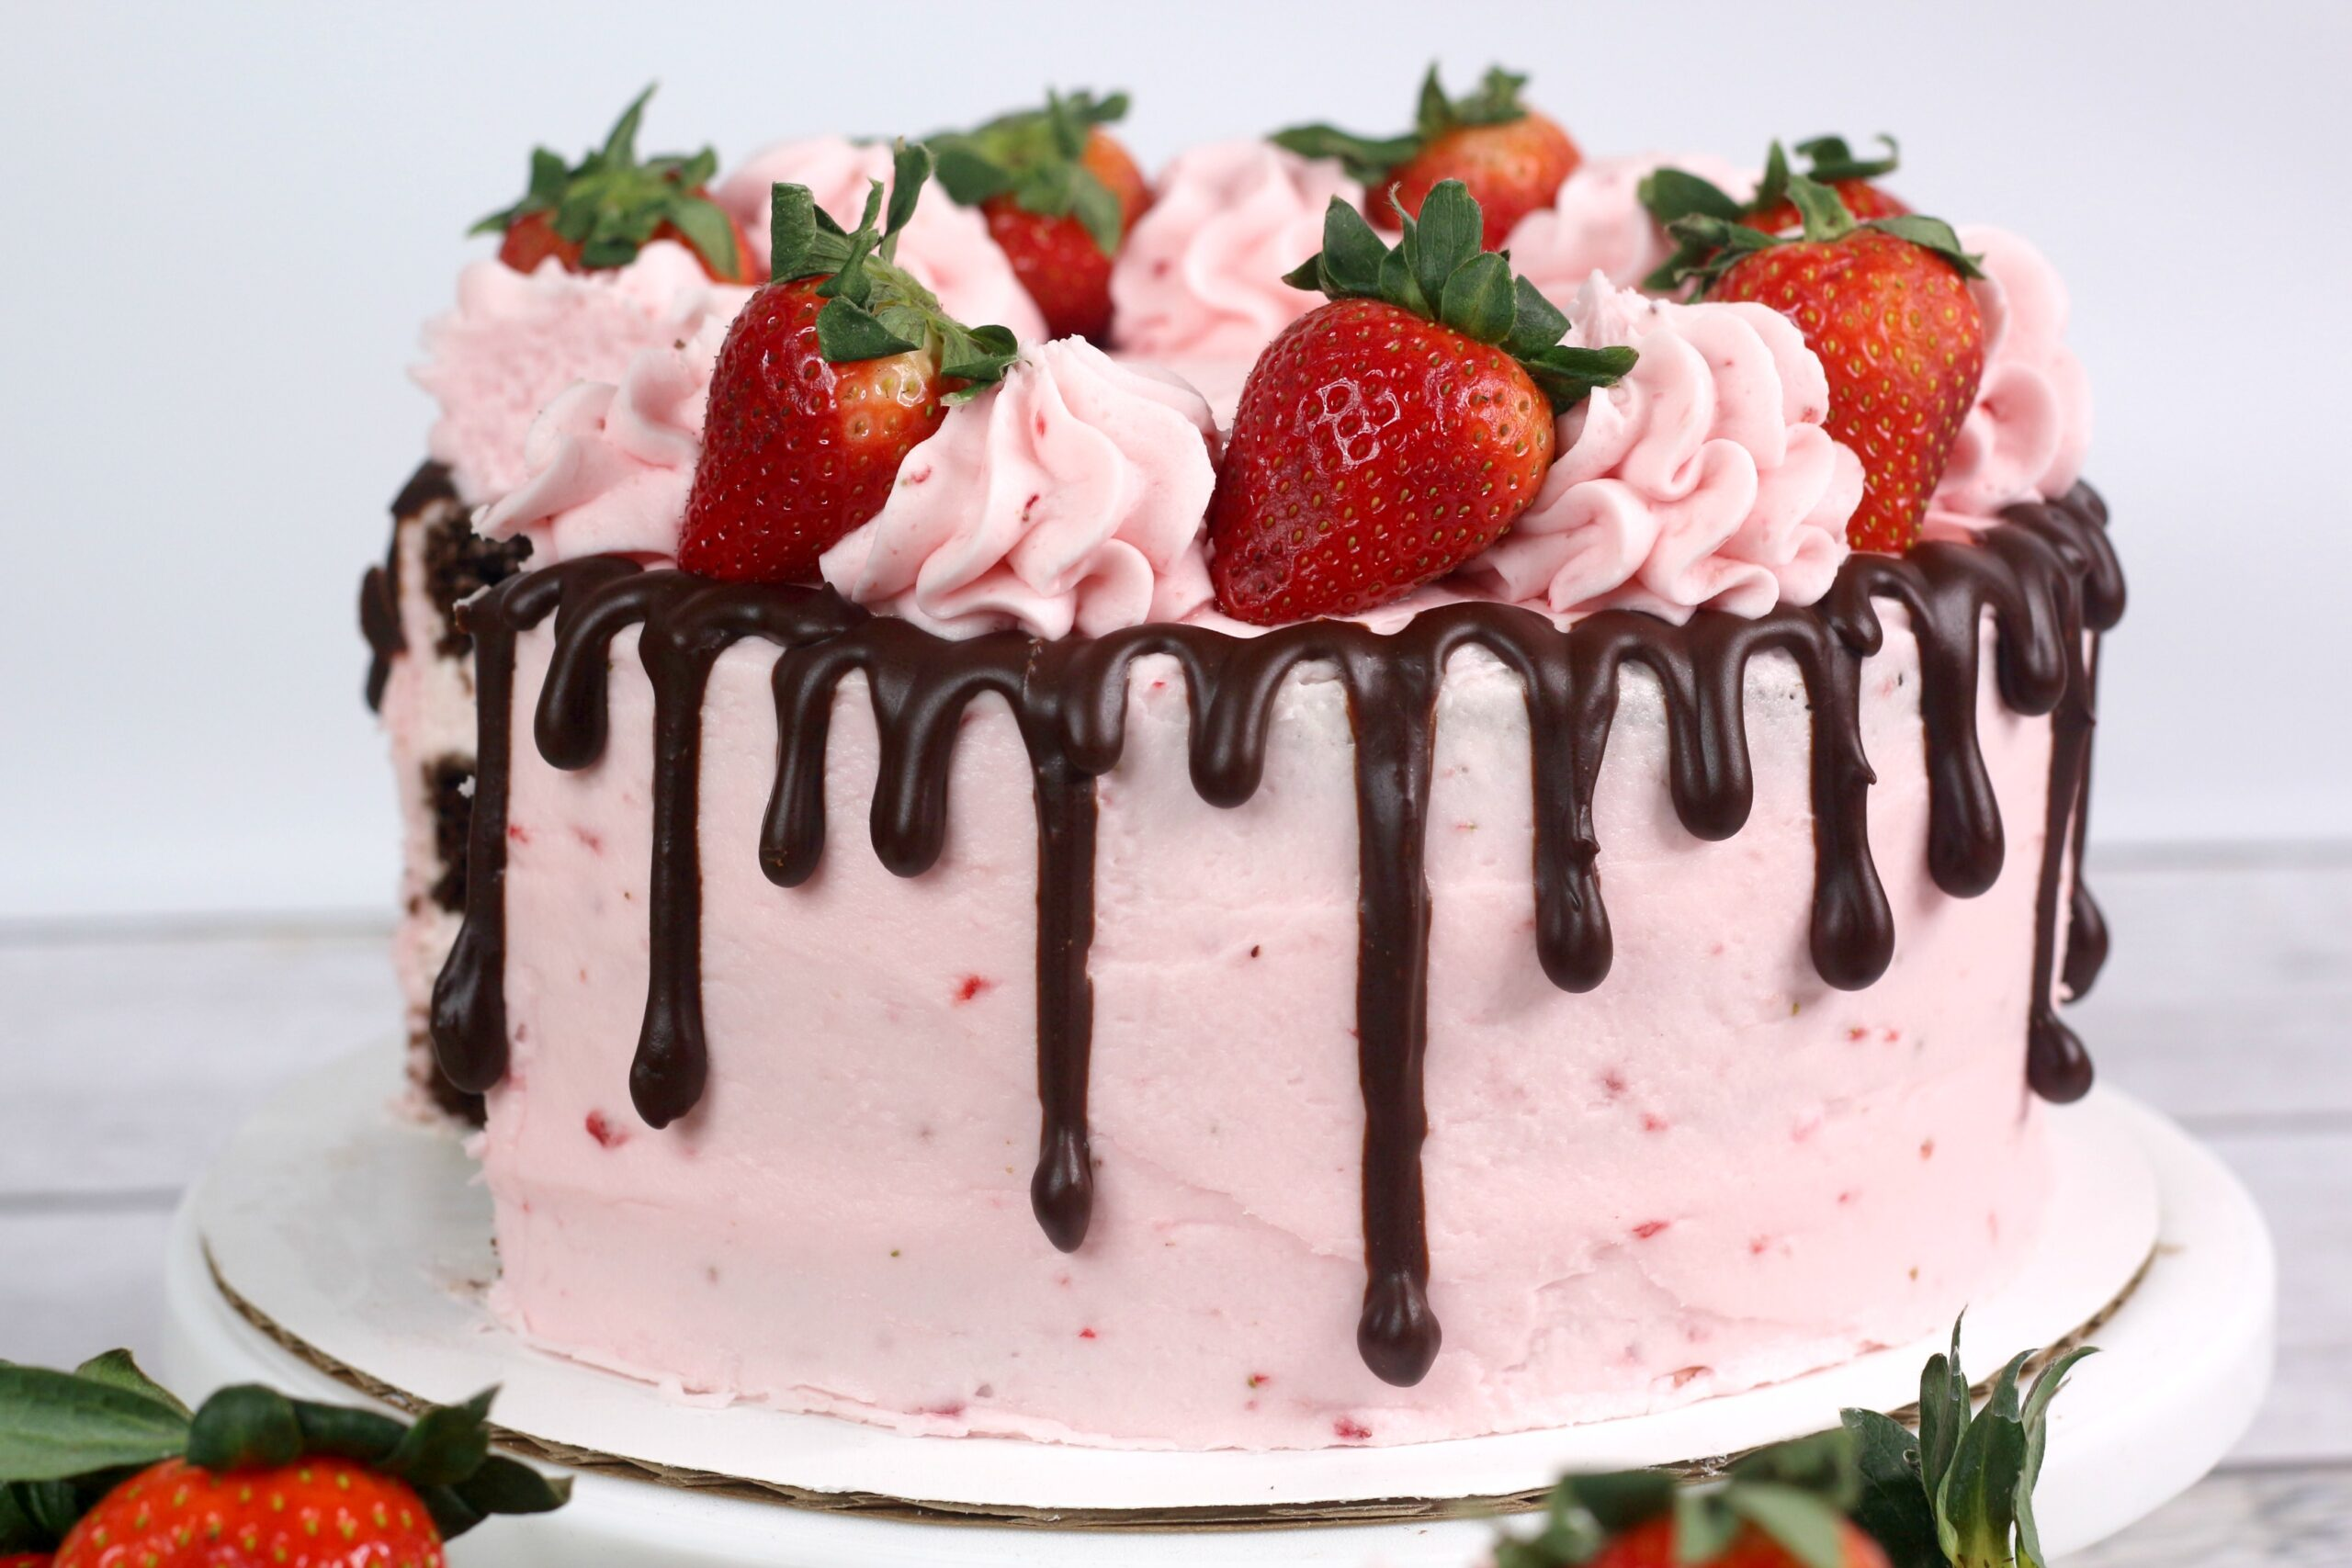 Remarkable Chocolate Kahlua Cake With Strawberry Buttercream Frosting Funny Birthday Cards Online Benoljebrpdamsfinfo